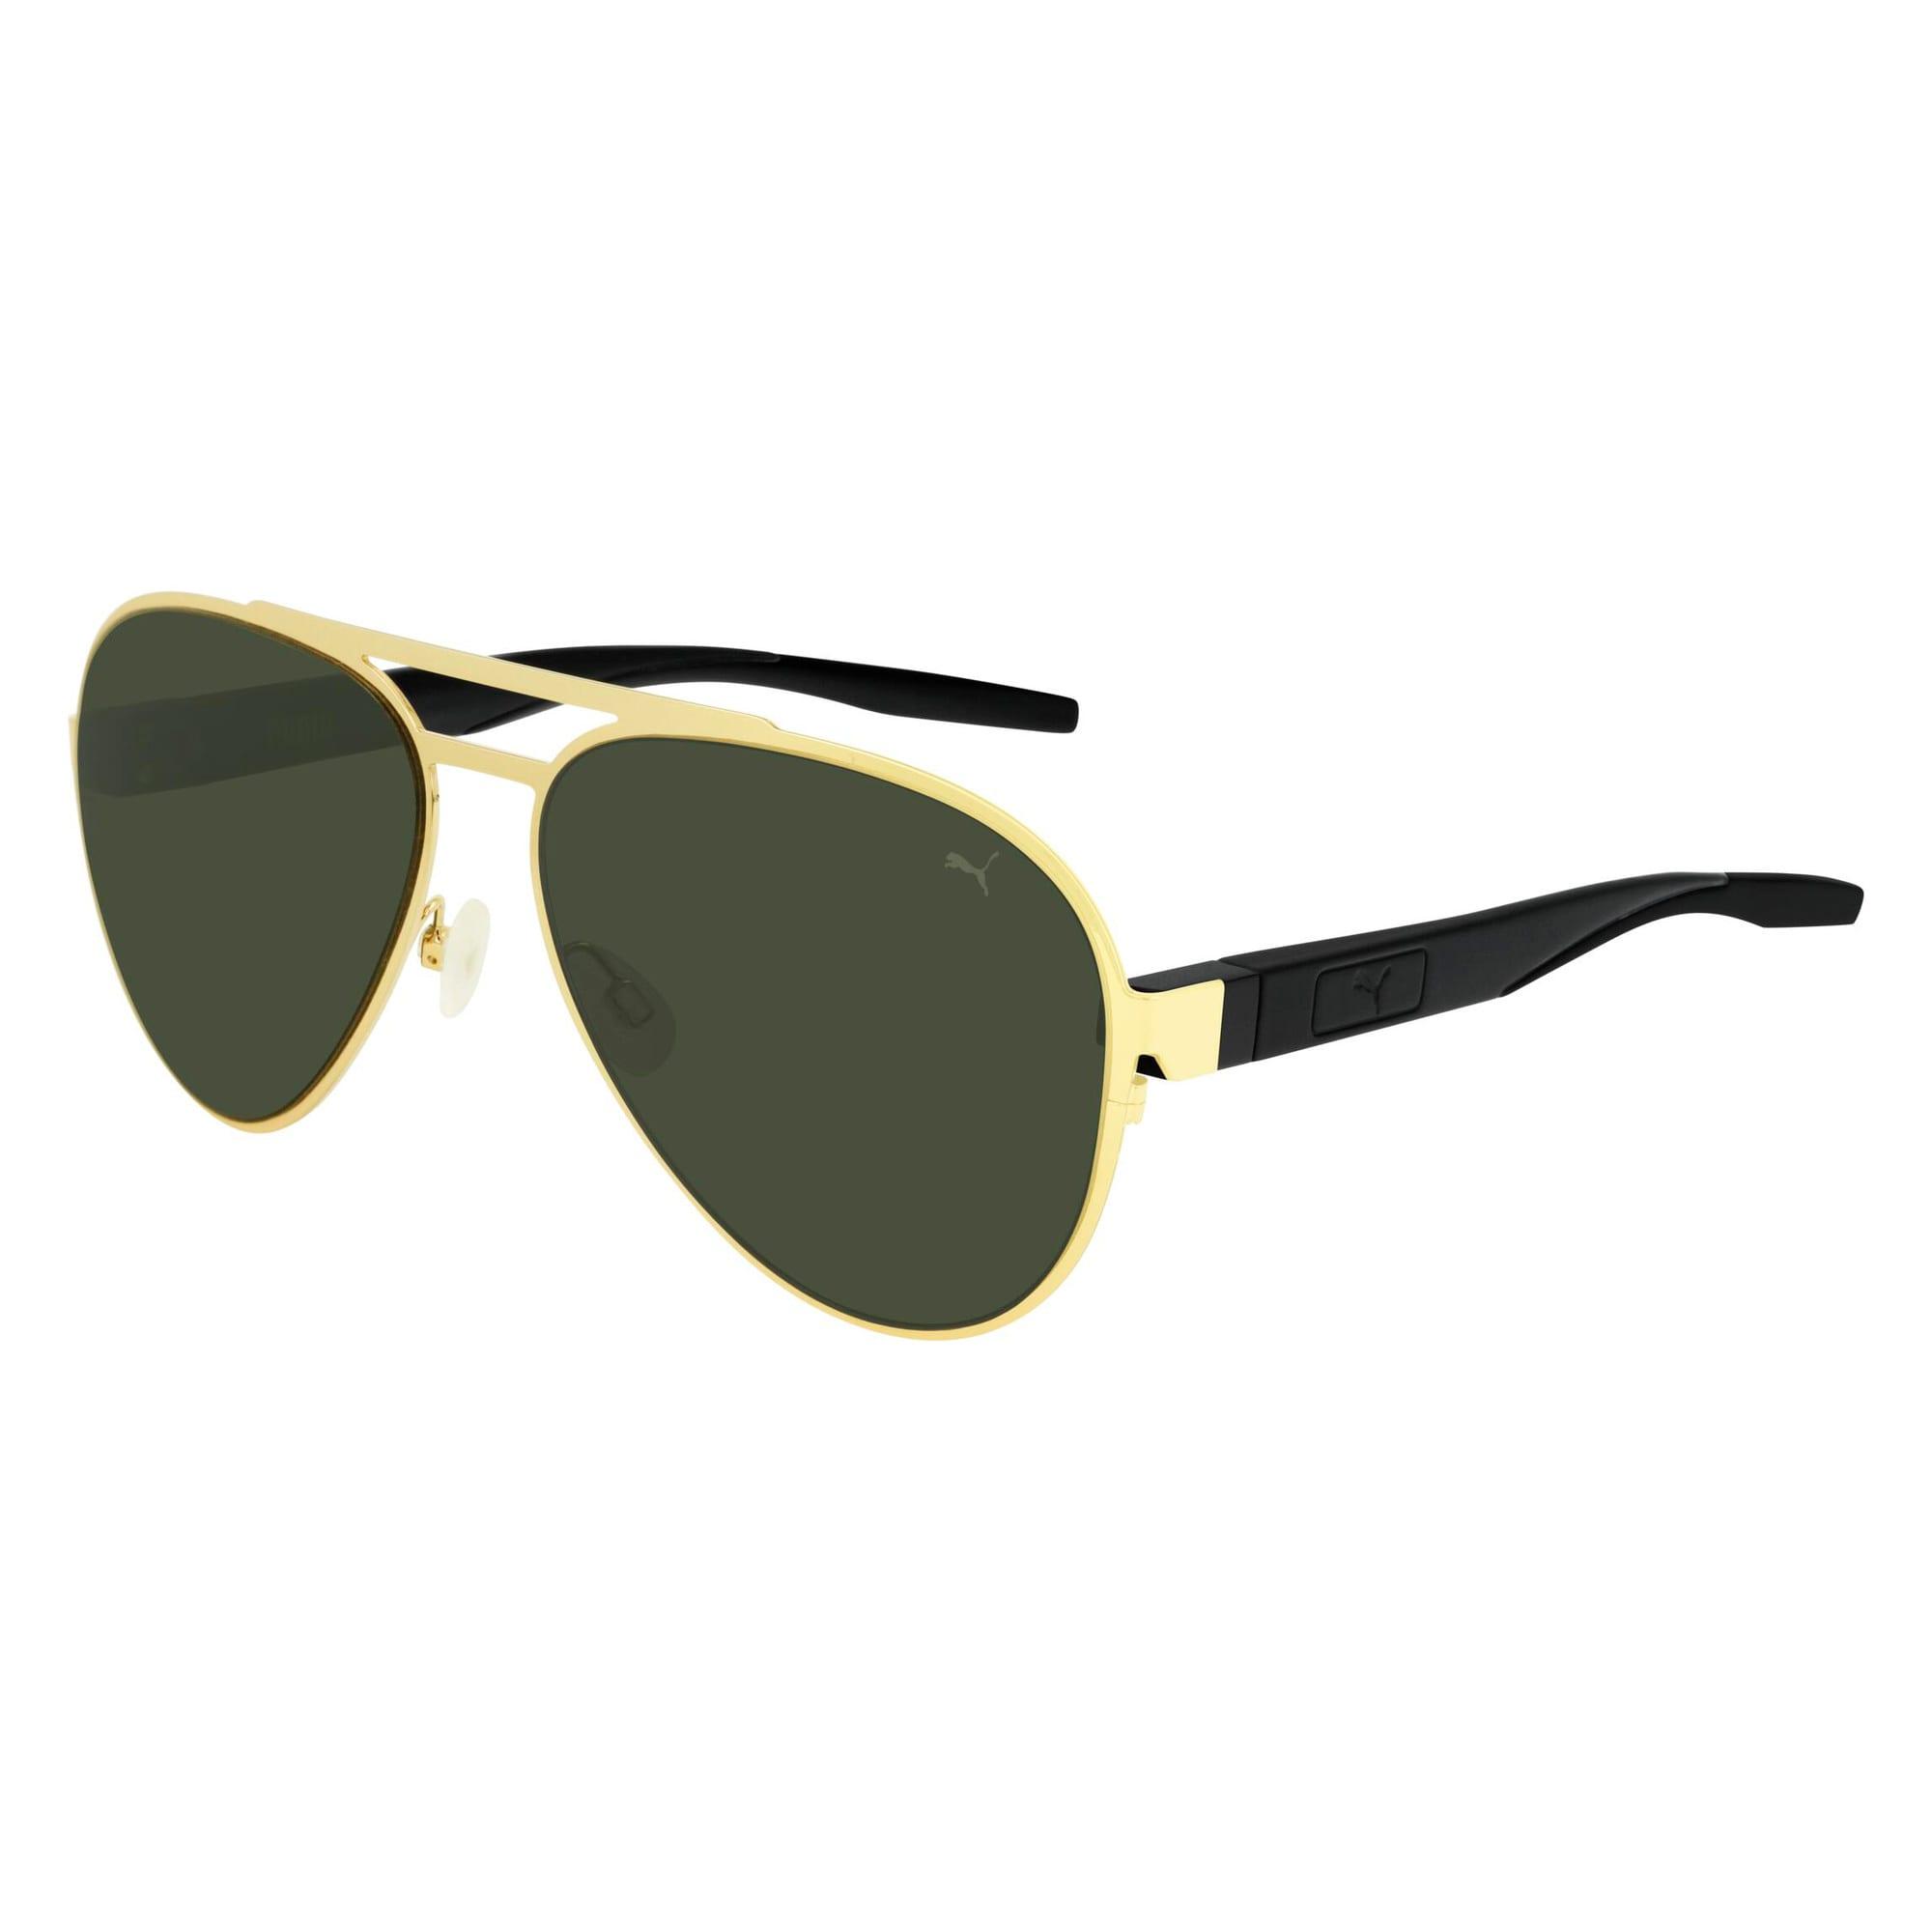 Thumbnail 1 of Vista Aviator Sunglasses, GOLD, medium